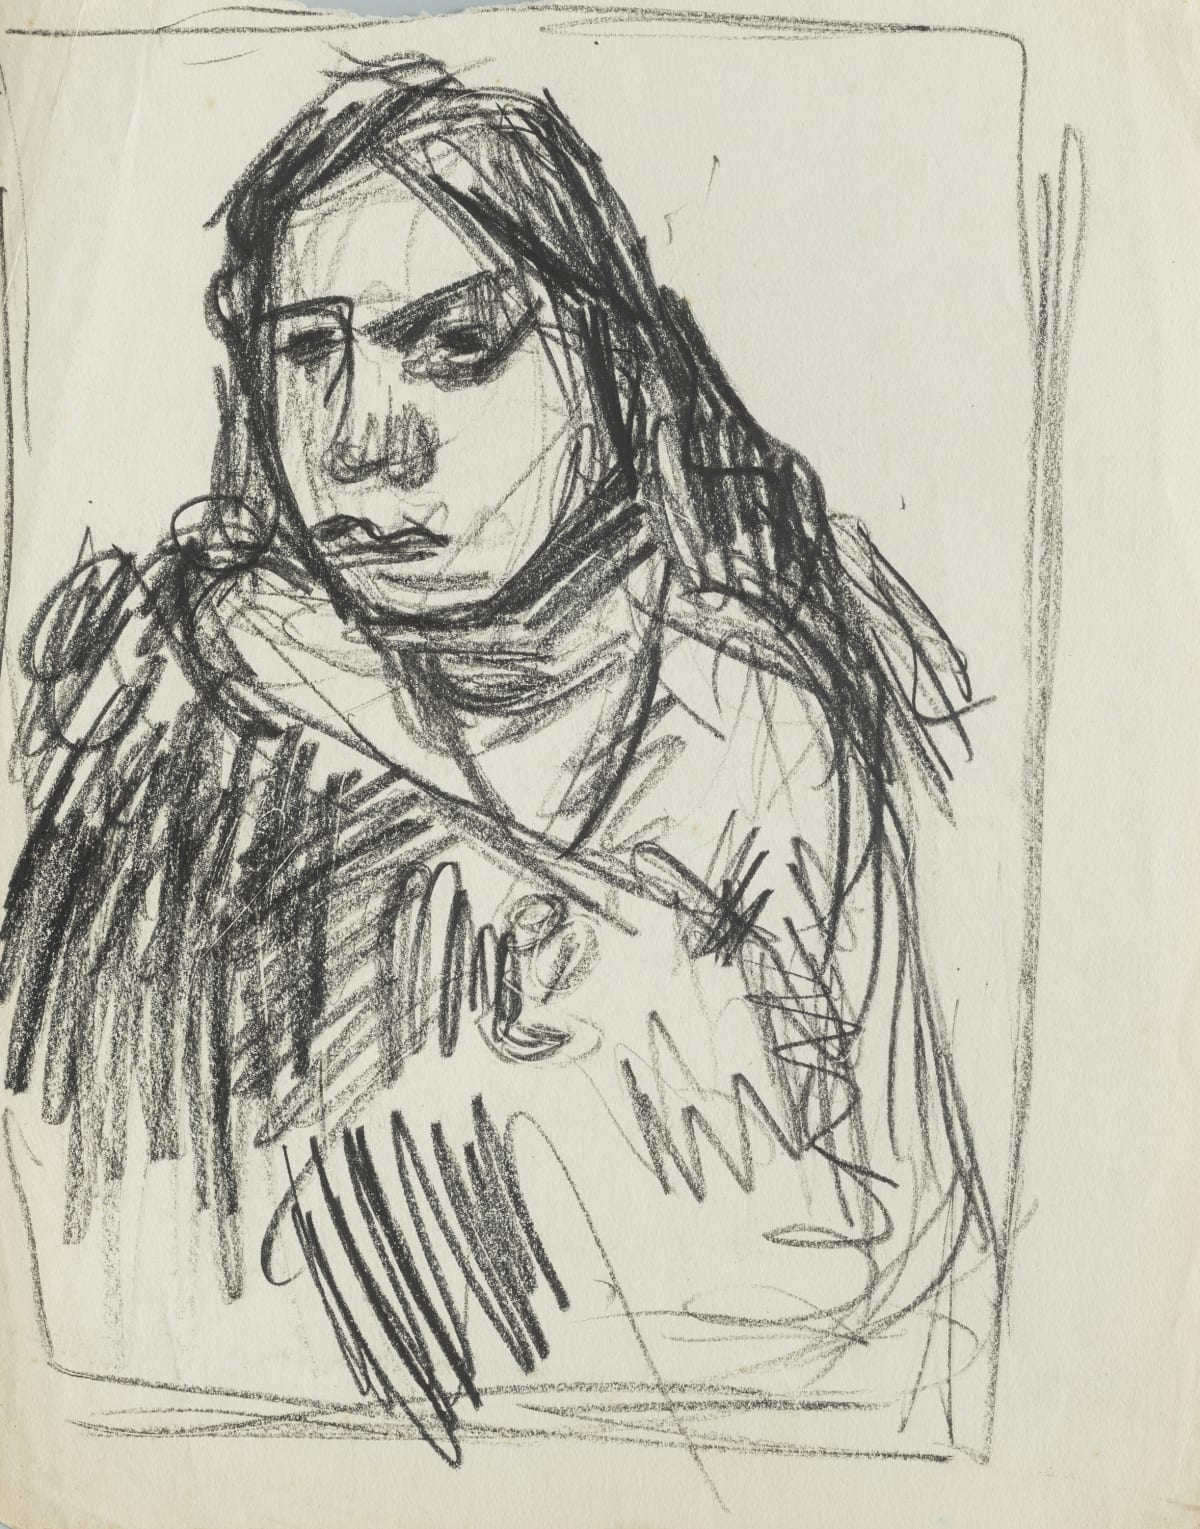 Mountford Tosswill Woollaston Head of a Maori Girl II, c1947 crayon on paper 310mm x 245mm